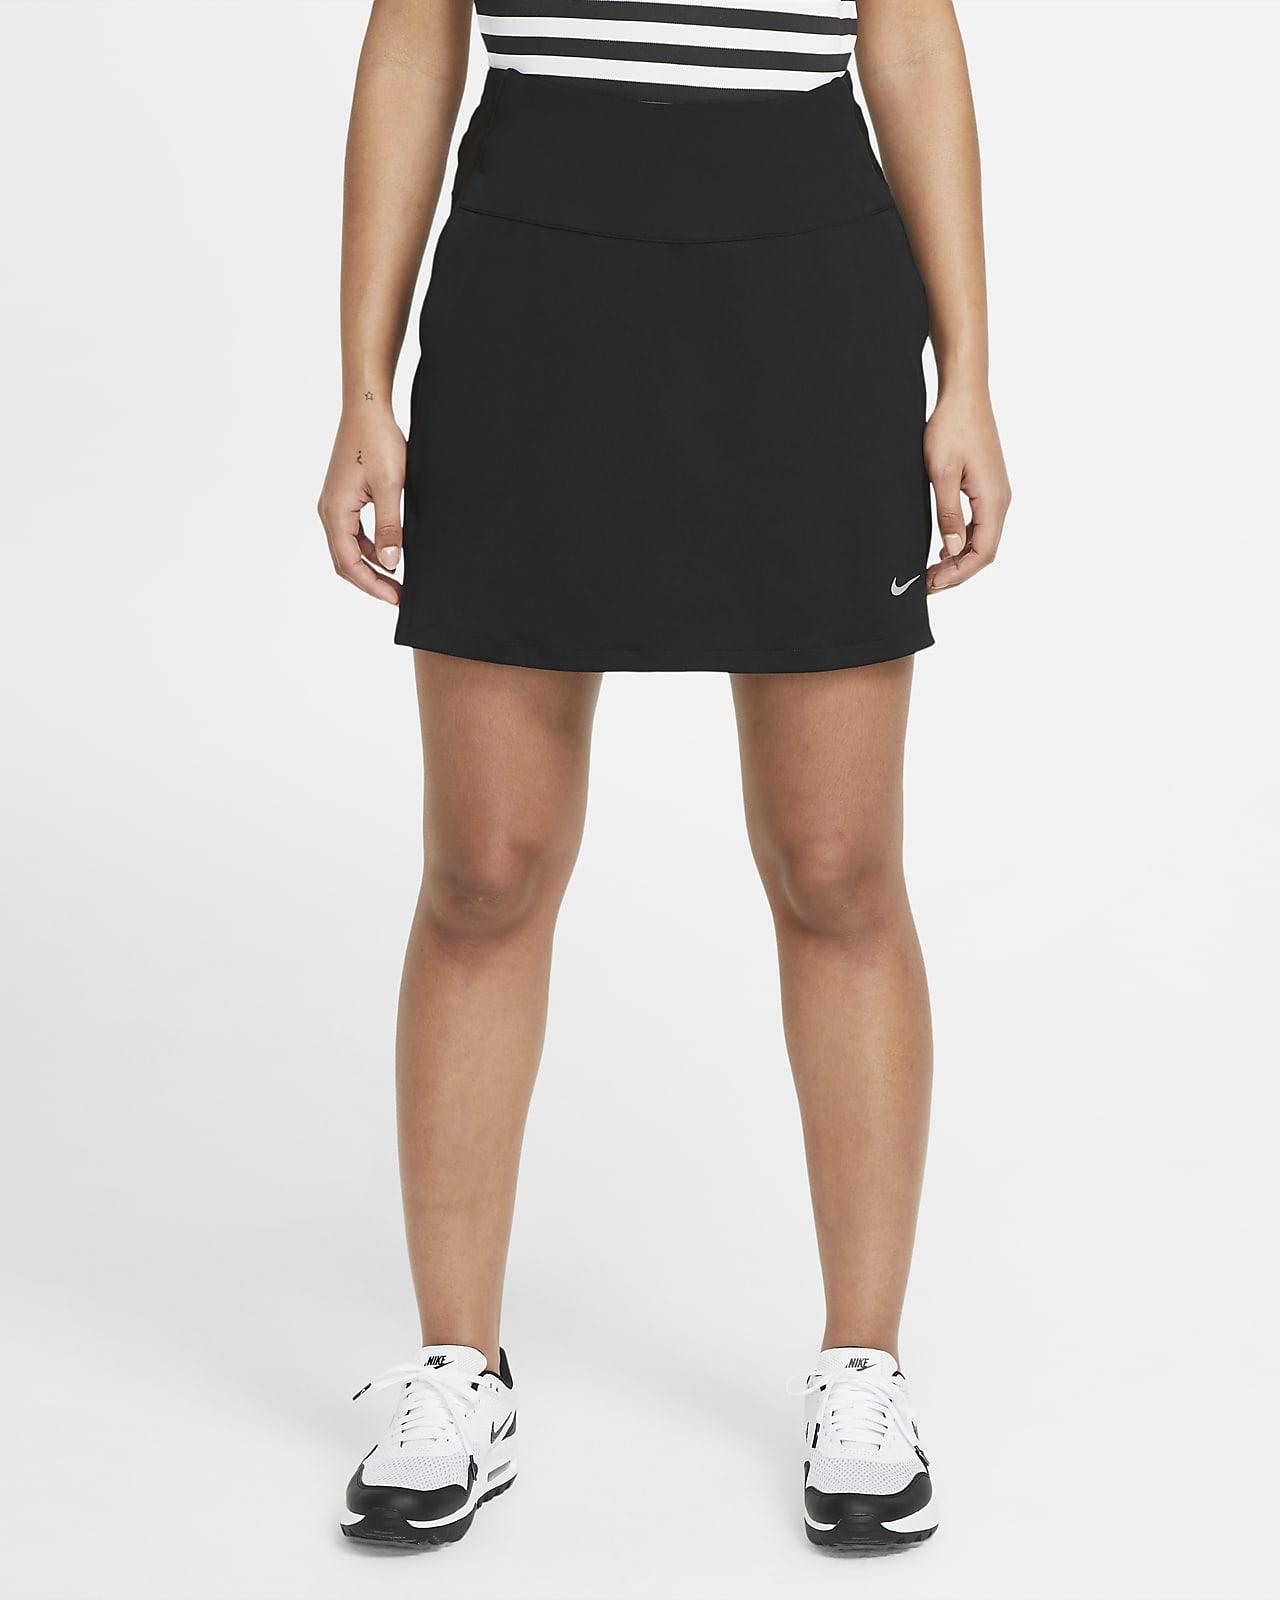 Nike Dri-FIT UV Victory Women's Golf Skirt